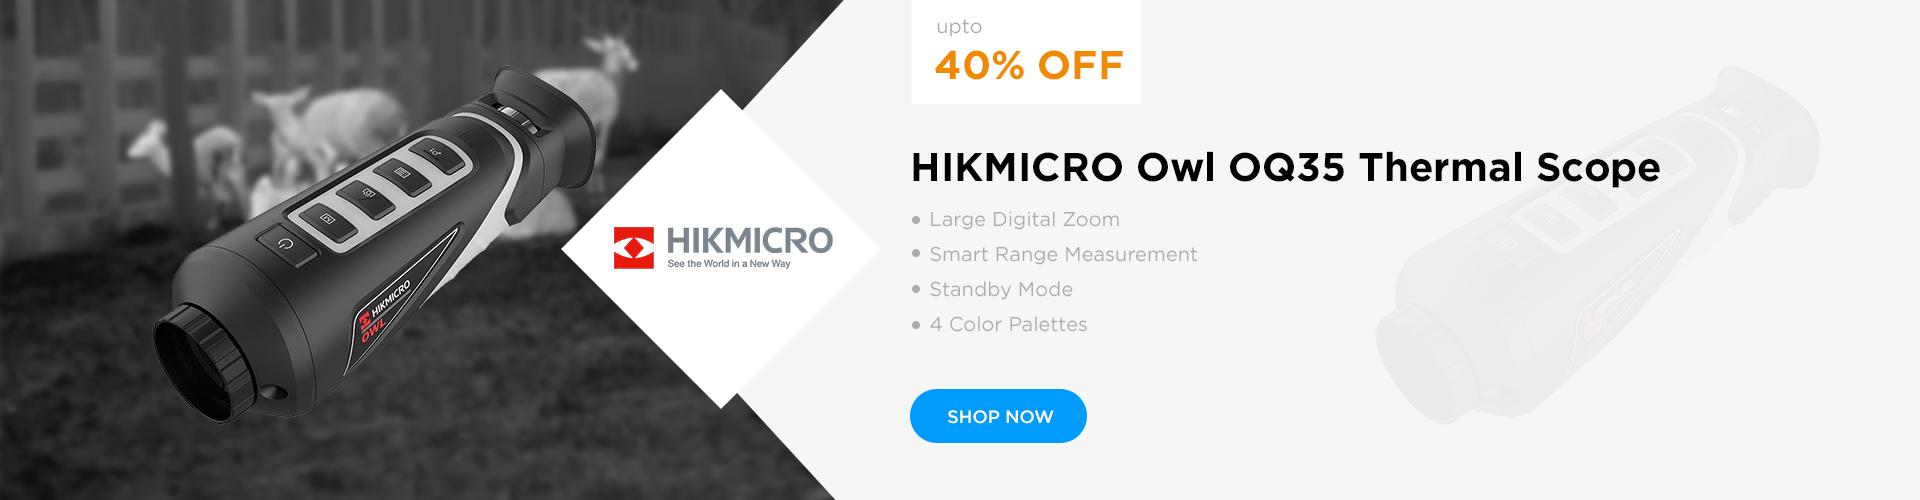 HIKMICRO Owl OQ35 Thermal Scope